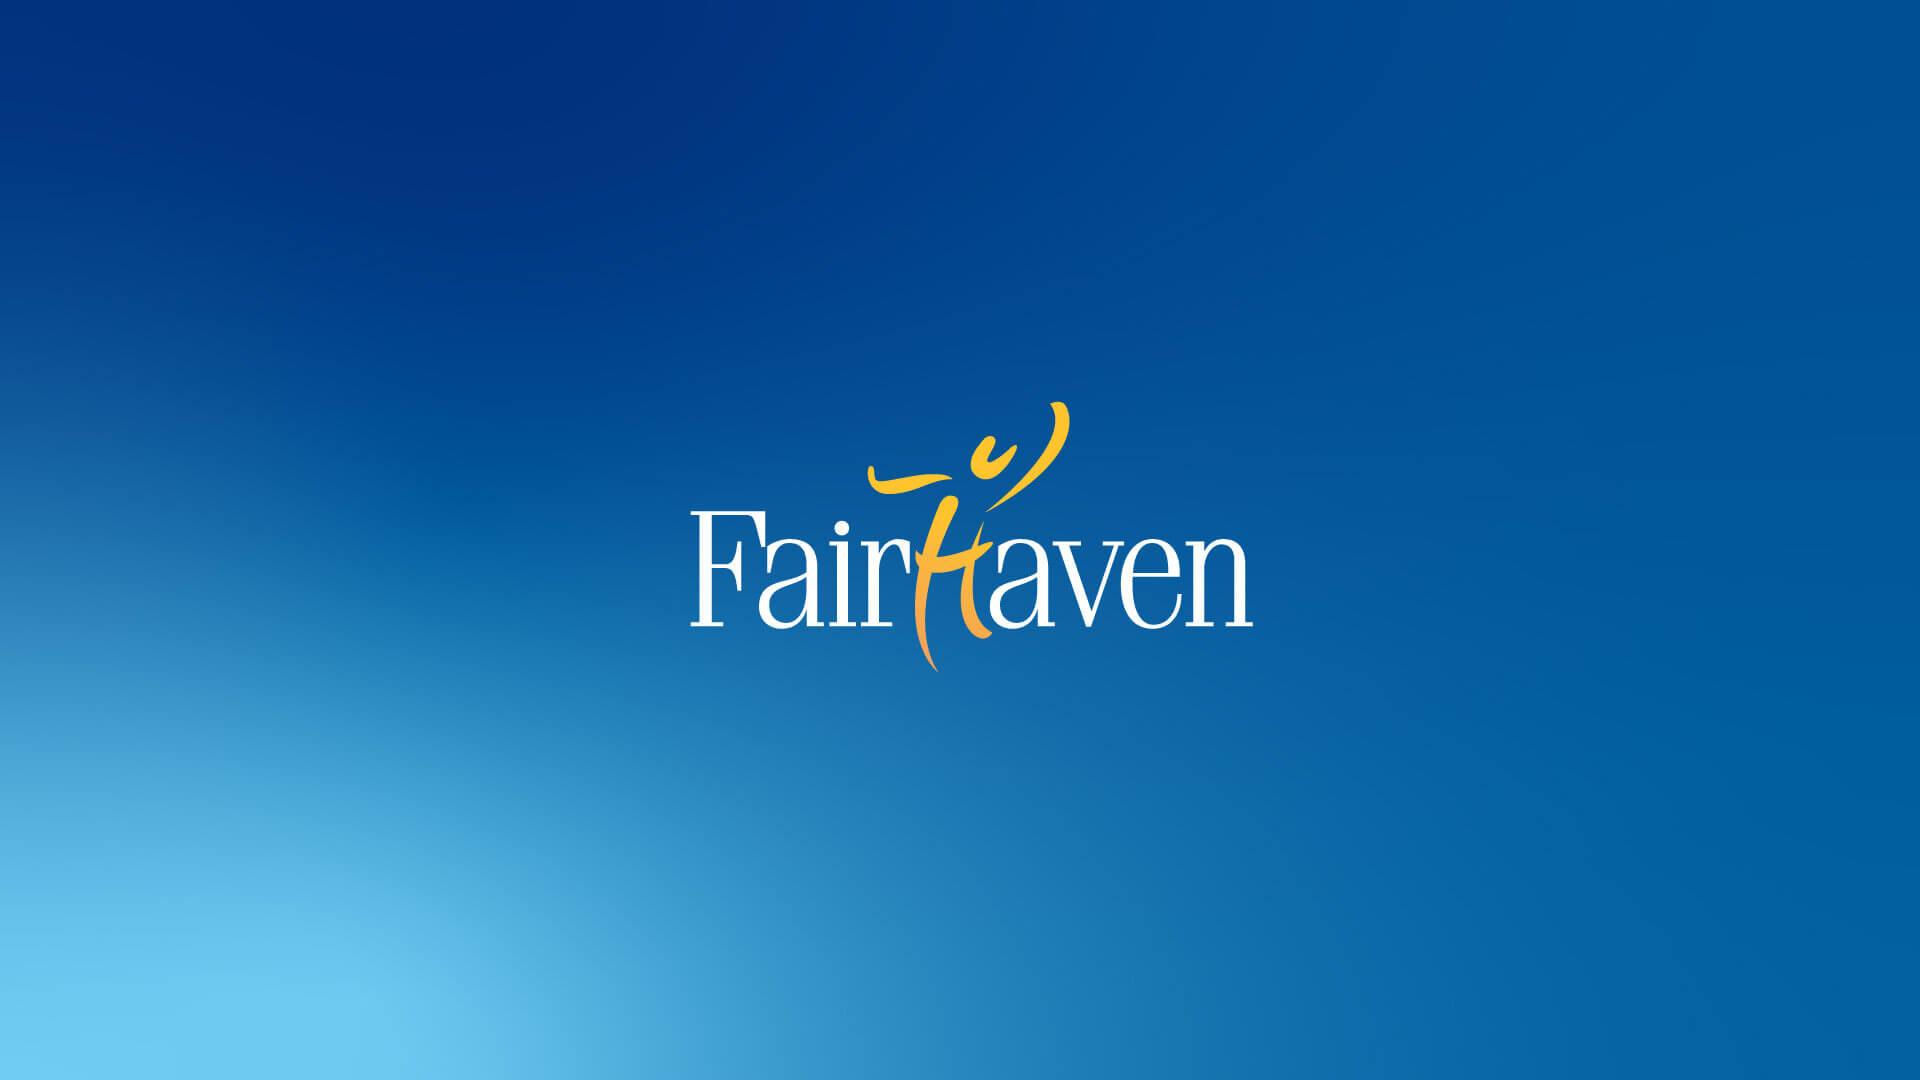 Church membership at Fairhaven